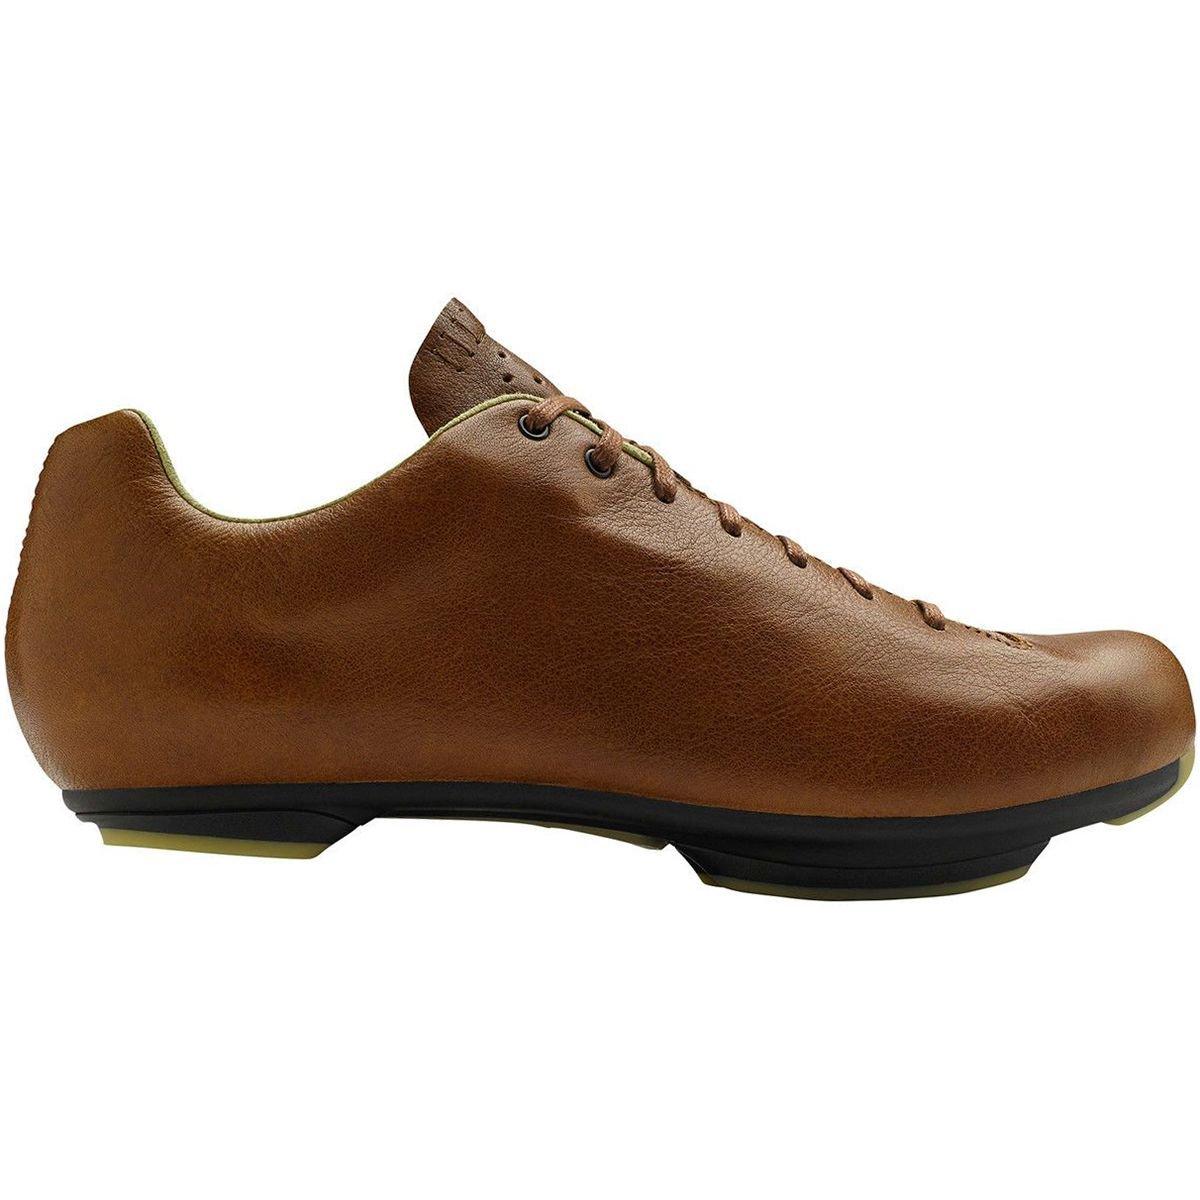 Giro Republic LX Shoe メンズ ロードバイクシューズ [並行輸入品] 日本サイズ 25cm (39) Sepia Leather/Black B07MCH5CMR